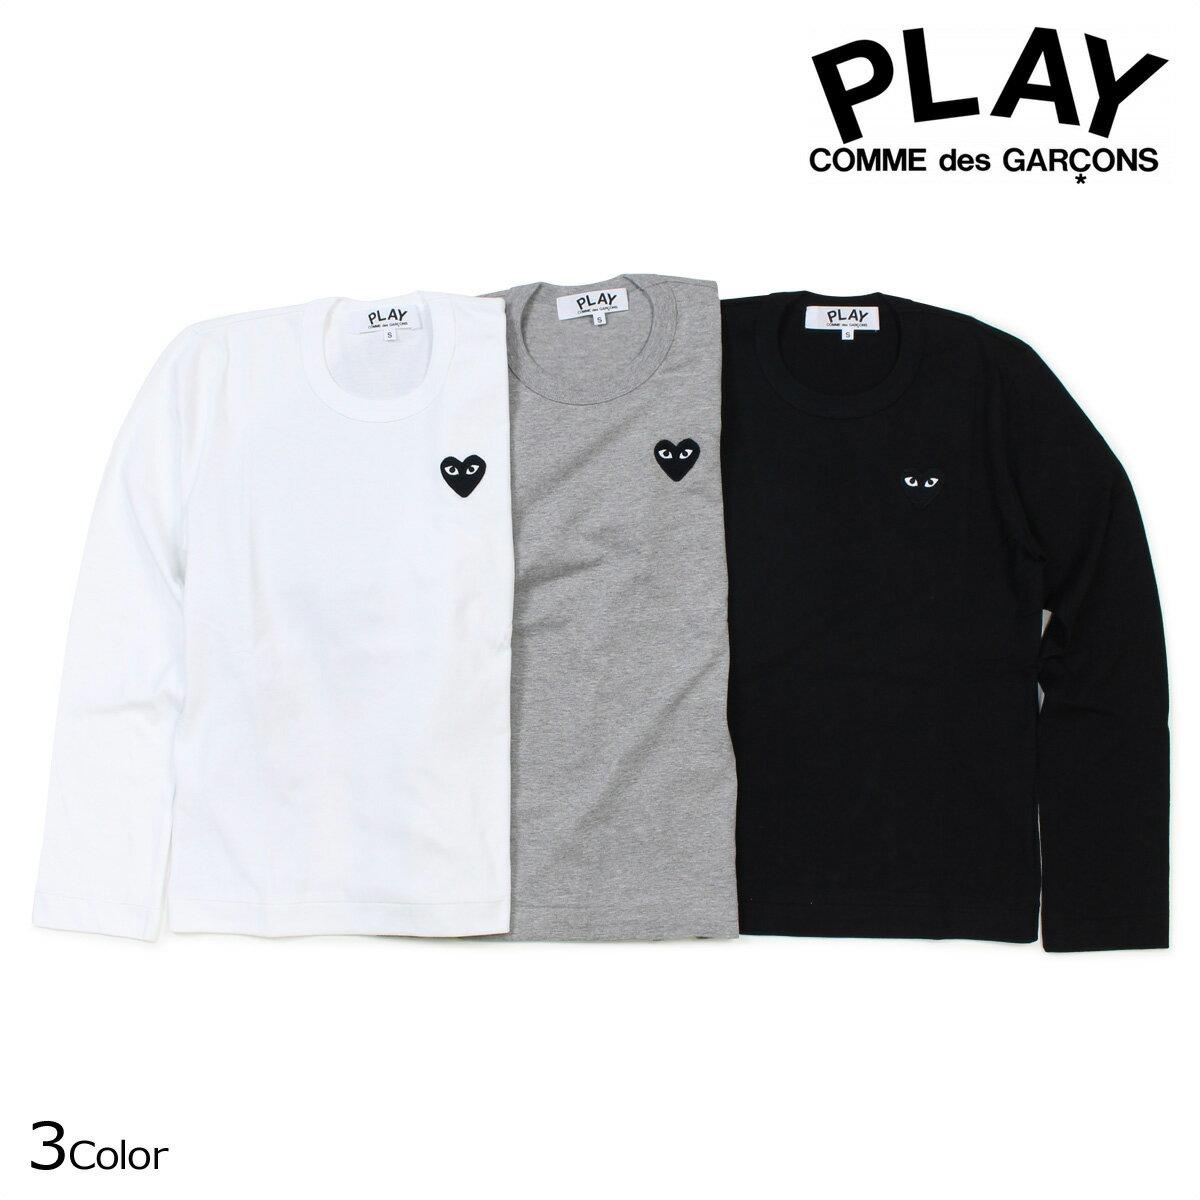 COMME des GARCONS PLAY Tシャツ 長袖 コムデギャルソン レディース BLACK HEART LS T-SHIRT カットソー AZ-T119 AZ-T121 ブラック ホワイト グレー